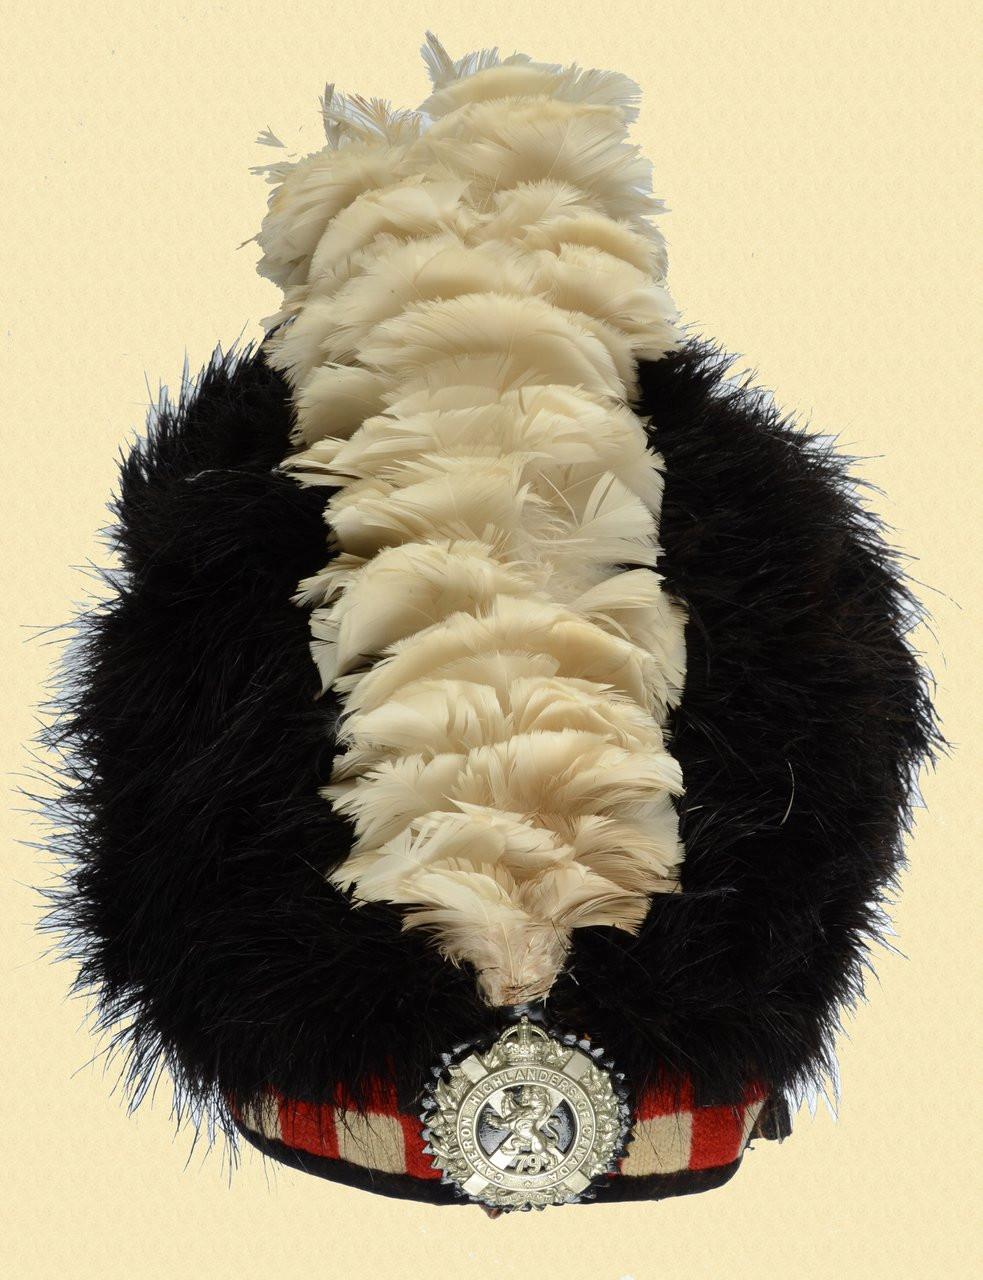 CANADIAN BEARSKIN PARADE HAT - C22827